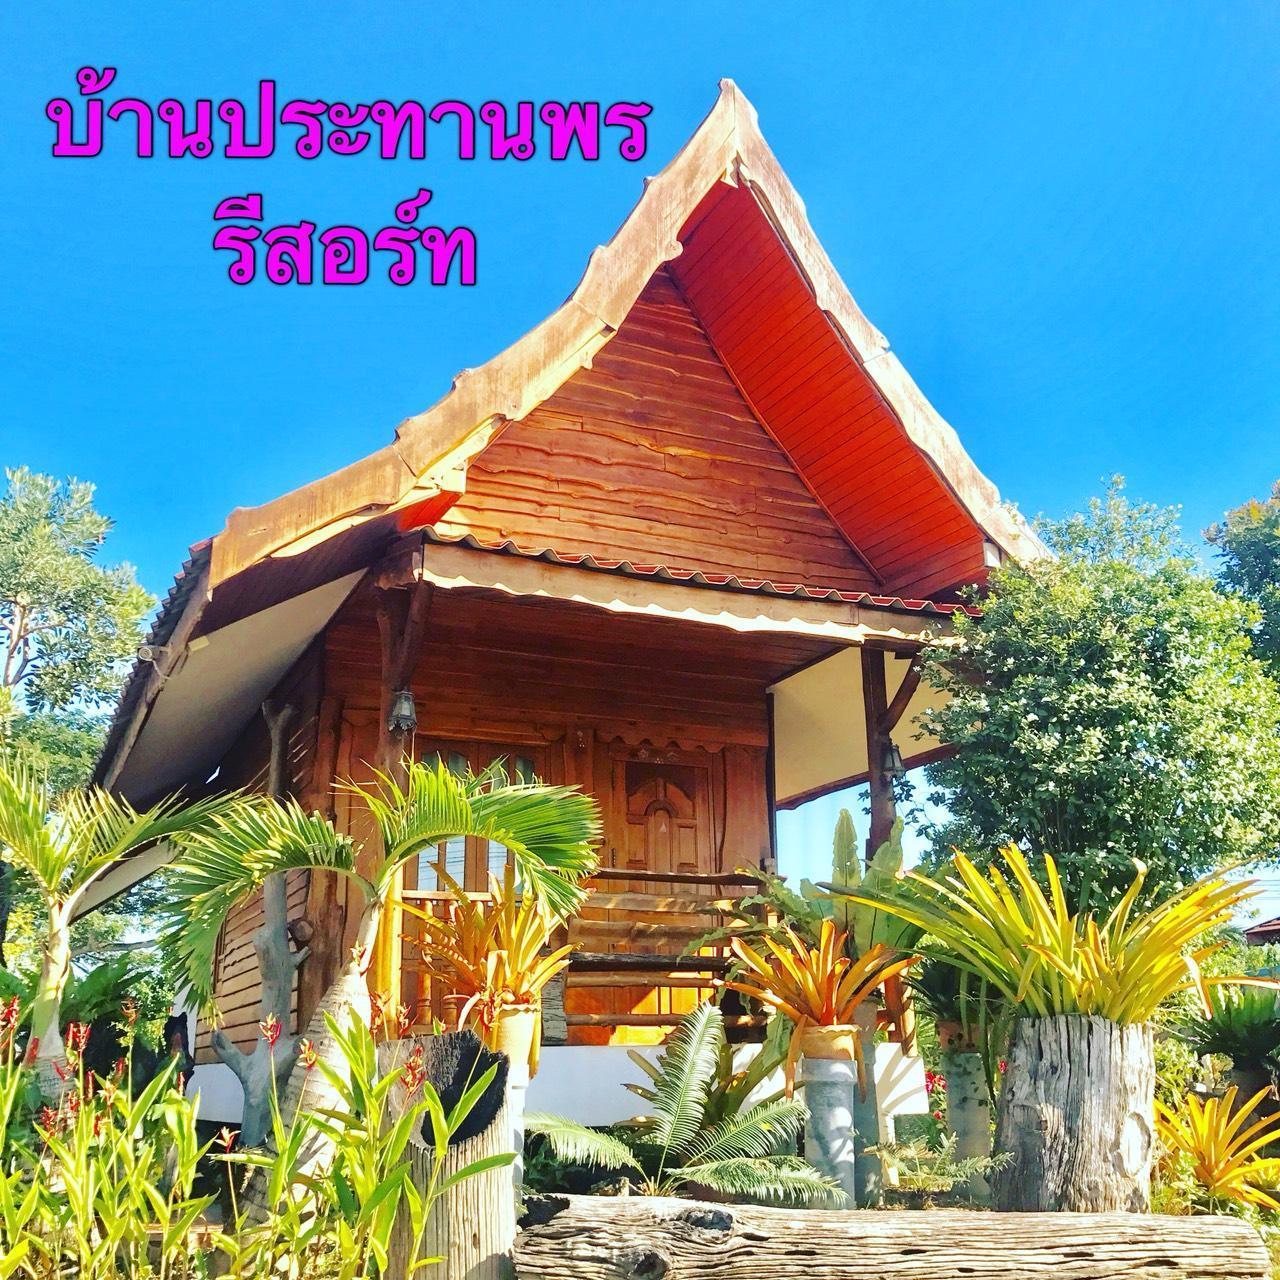 Ban Prathanporn Resort